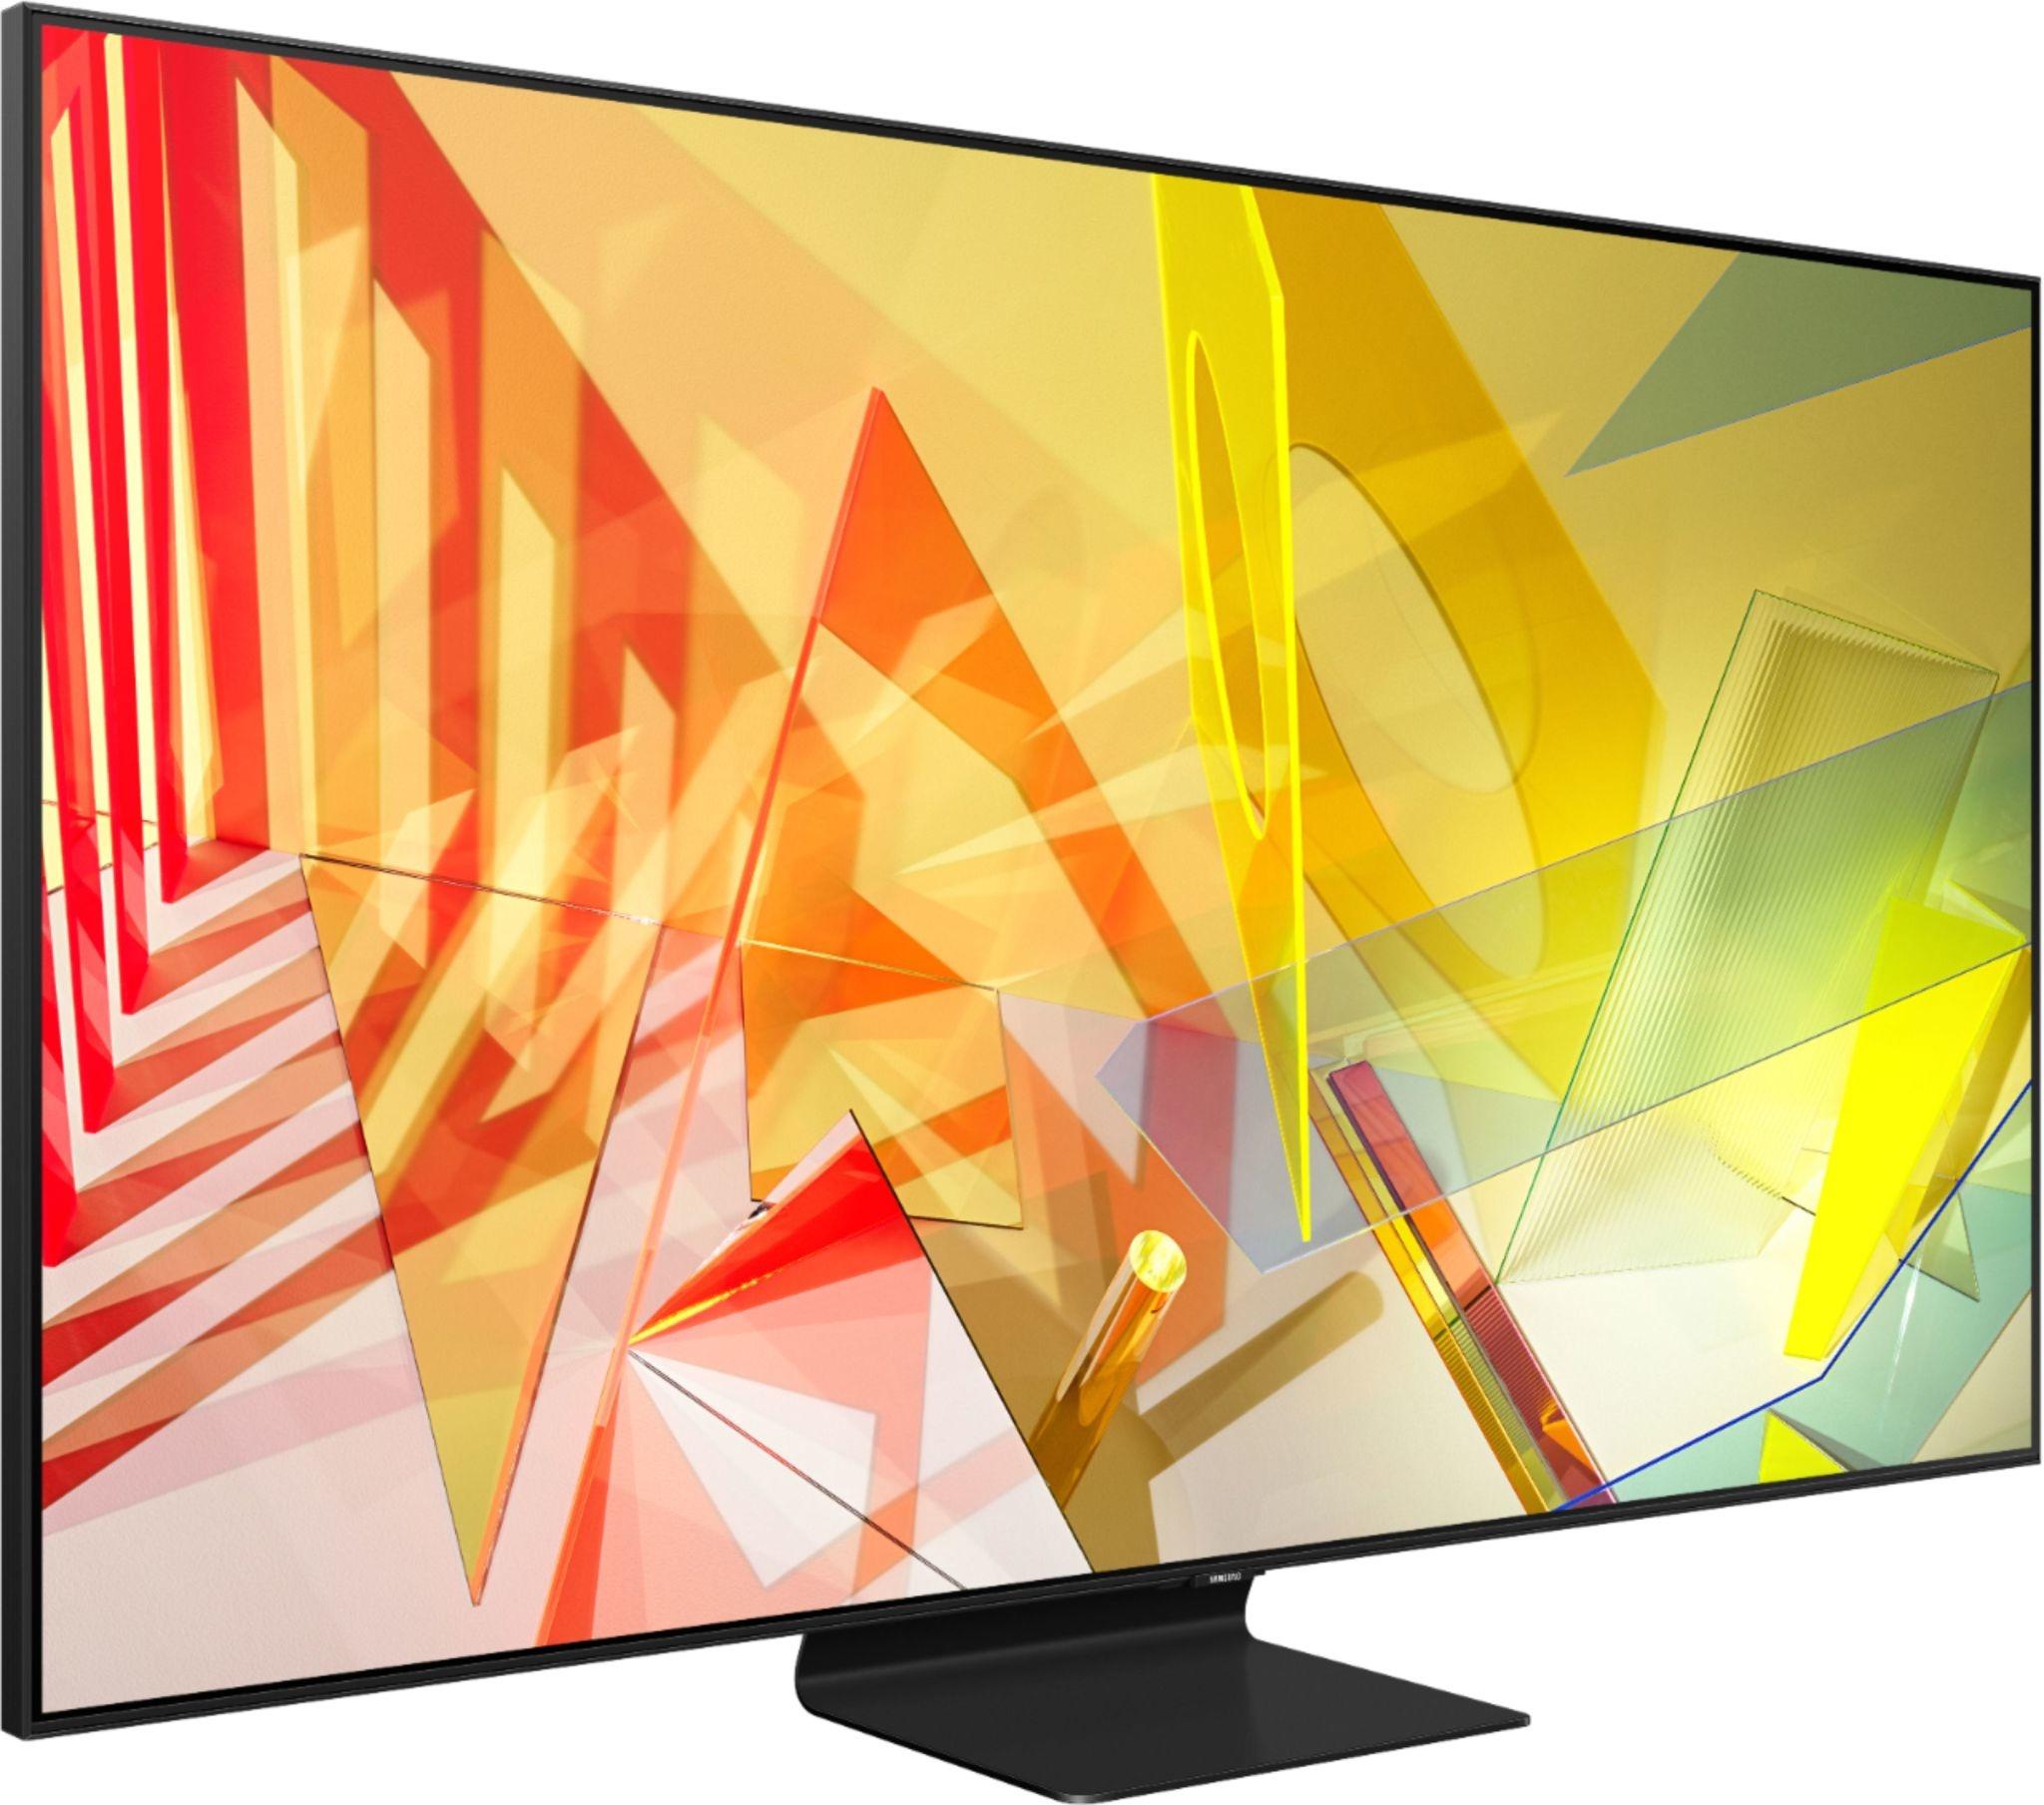 Samsung Samsung QN55Q90T QLED 4K HDR Smart TV